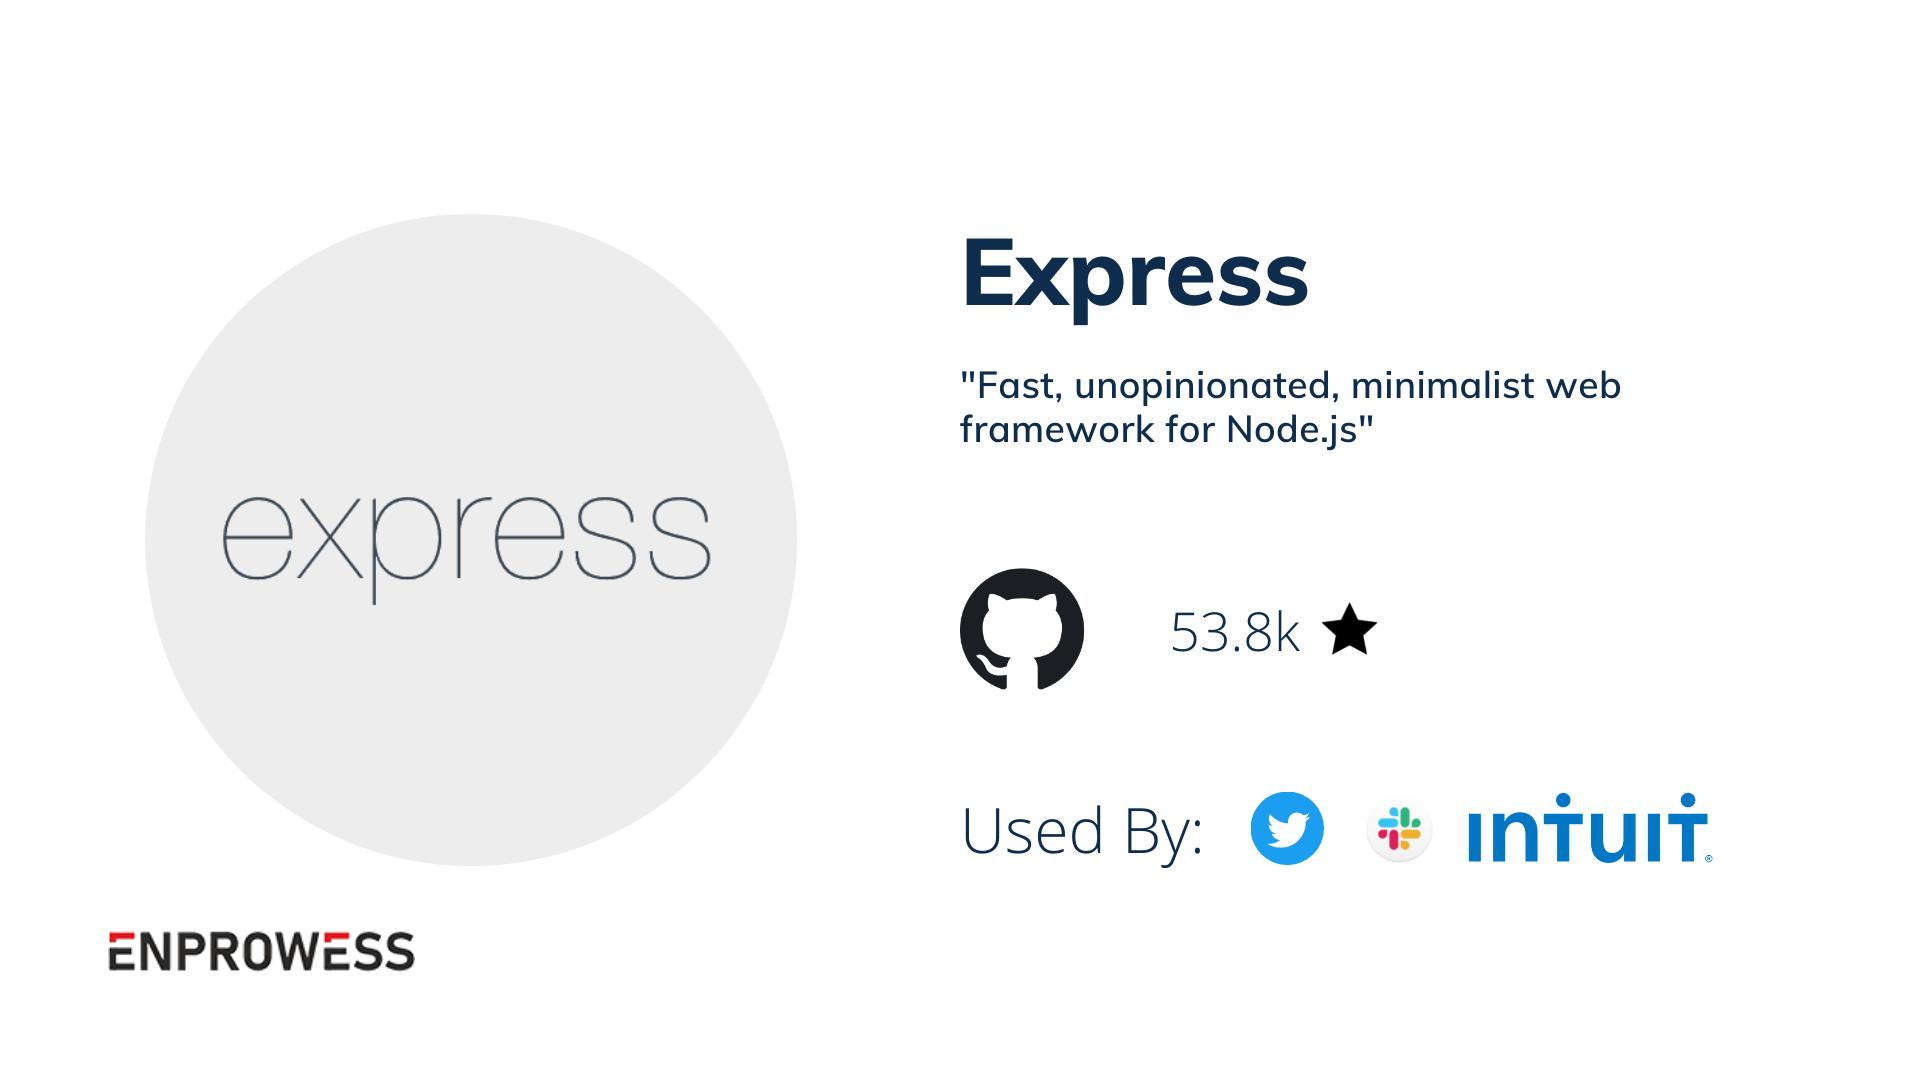 Expressjs details